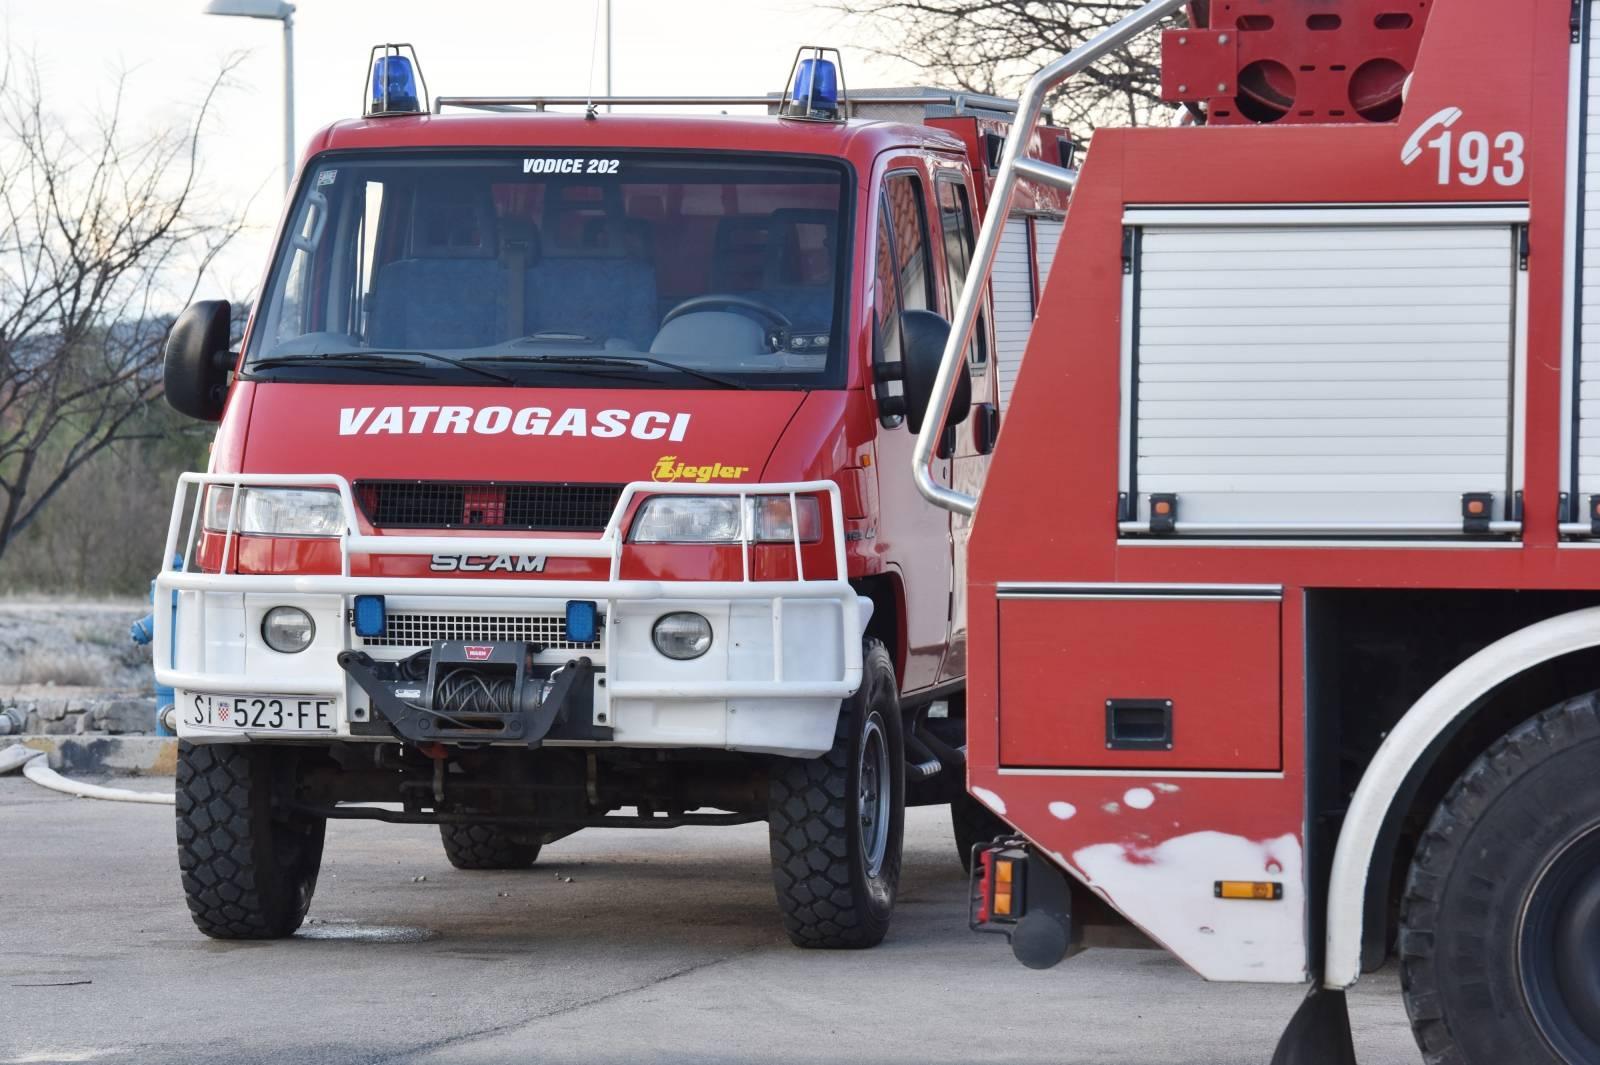 Vatrogasna vozila i oprema DVD-a Vodice